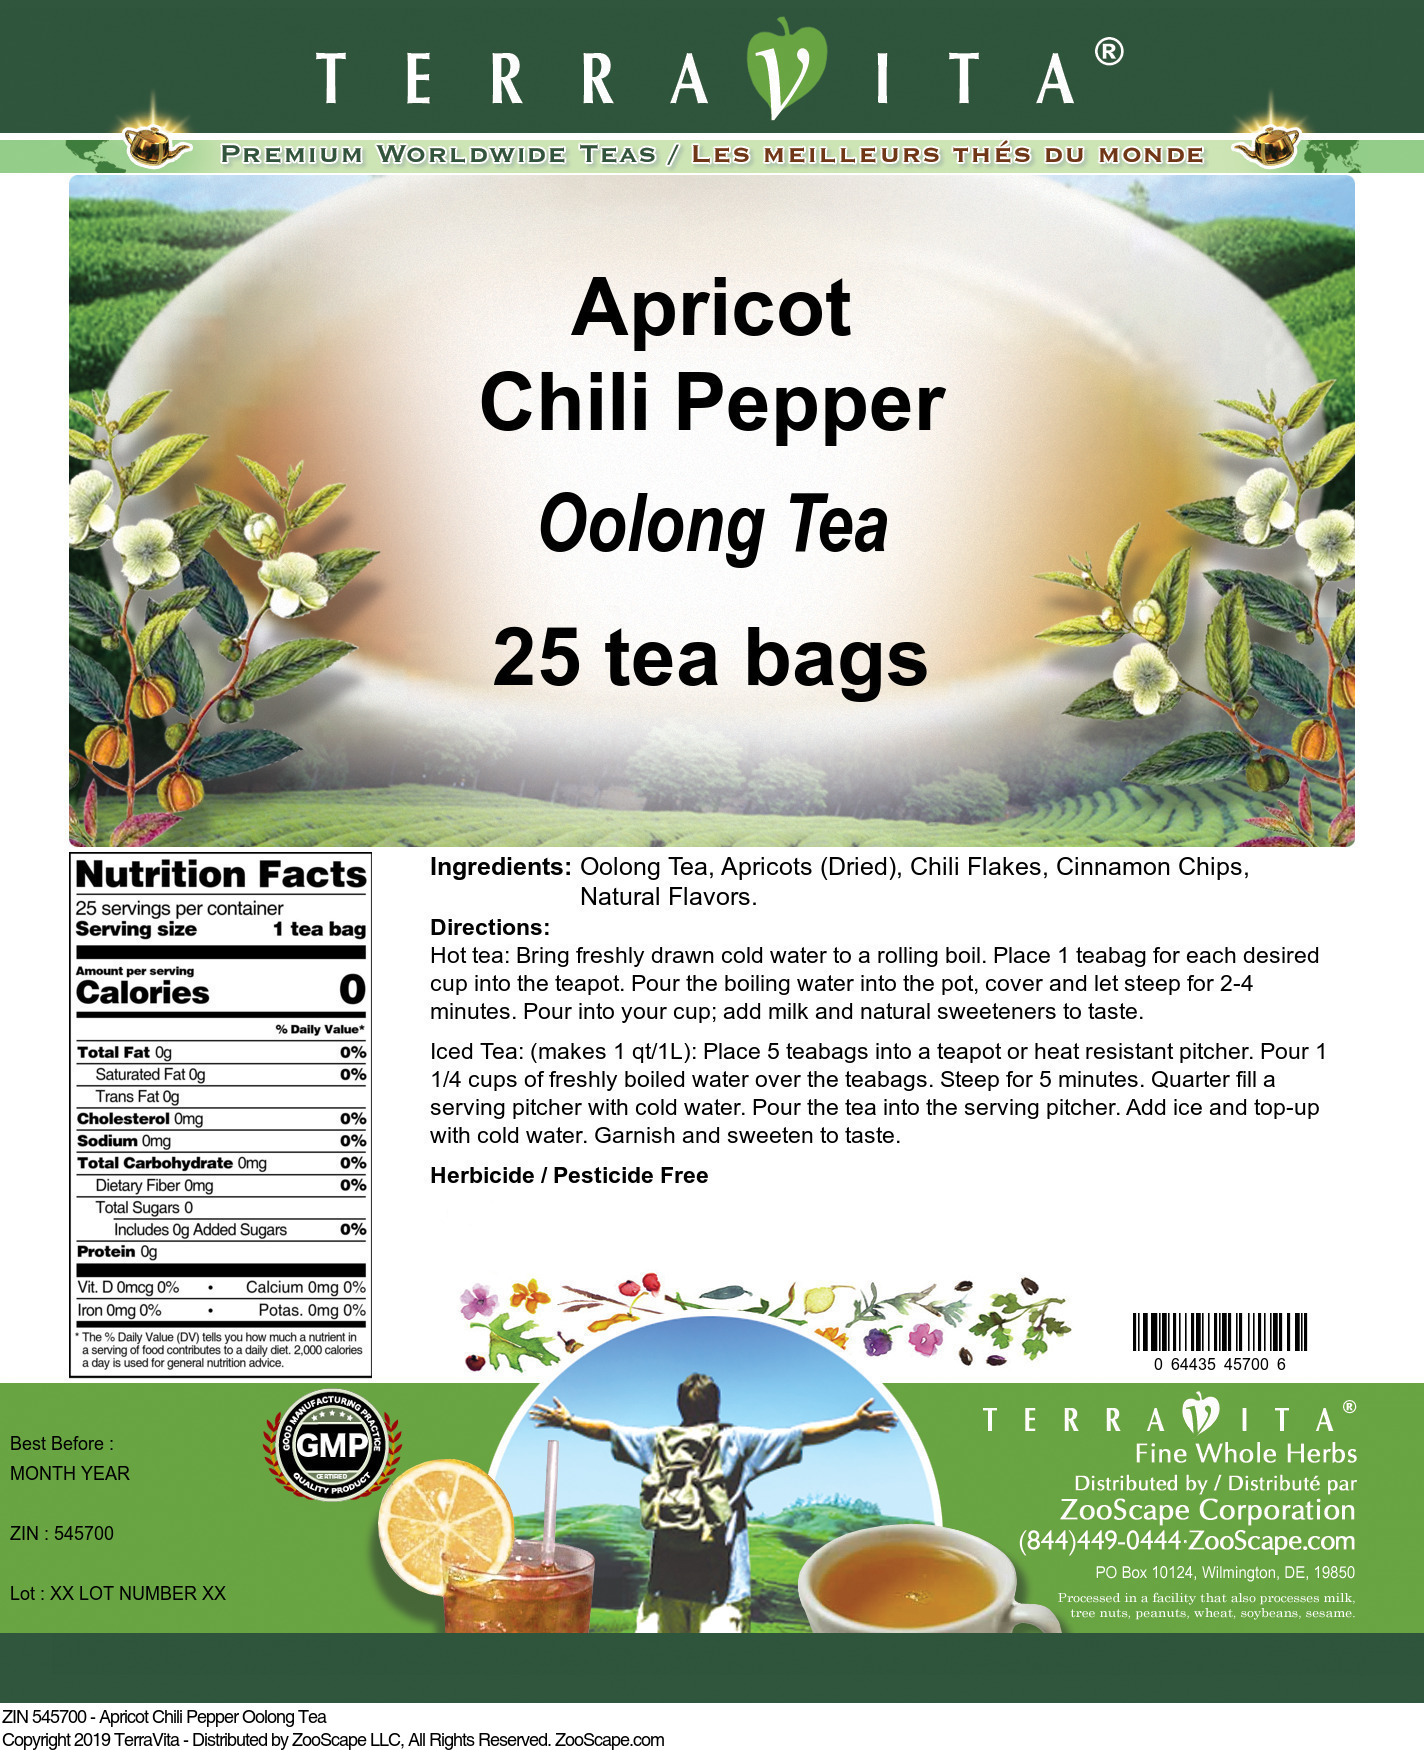 Apricot Chili Pepper Oolong Tea